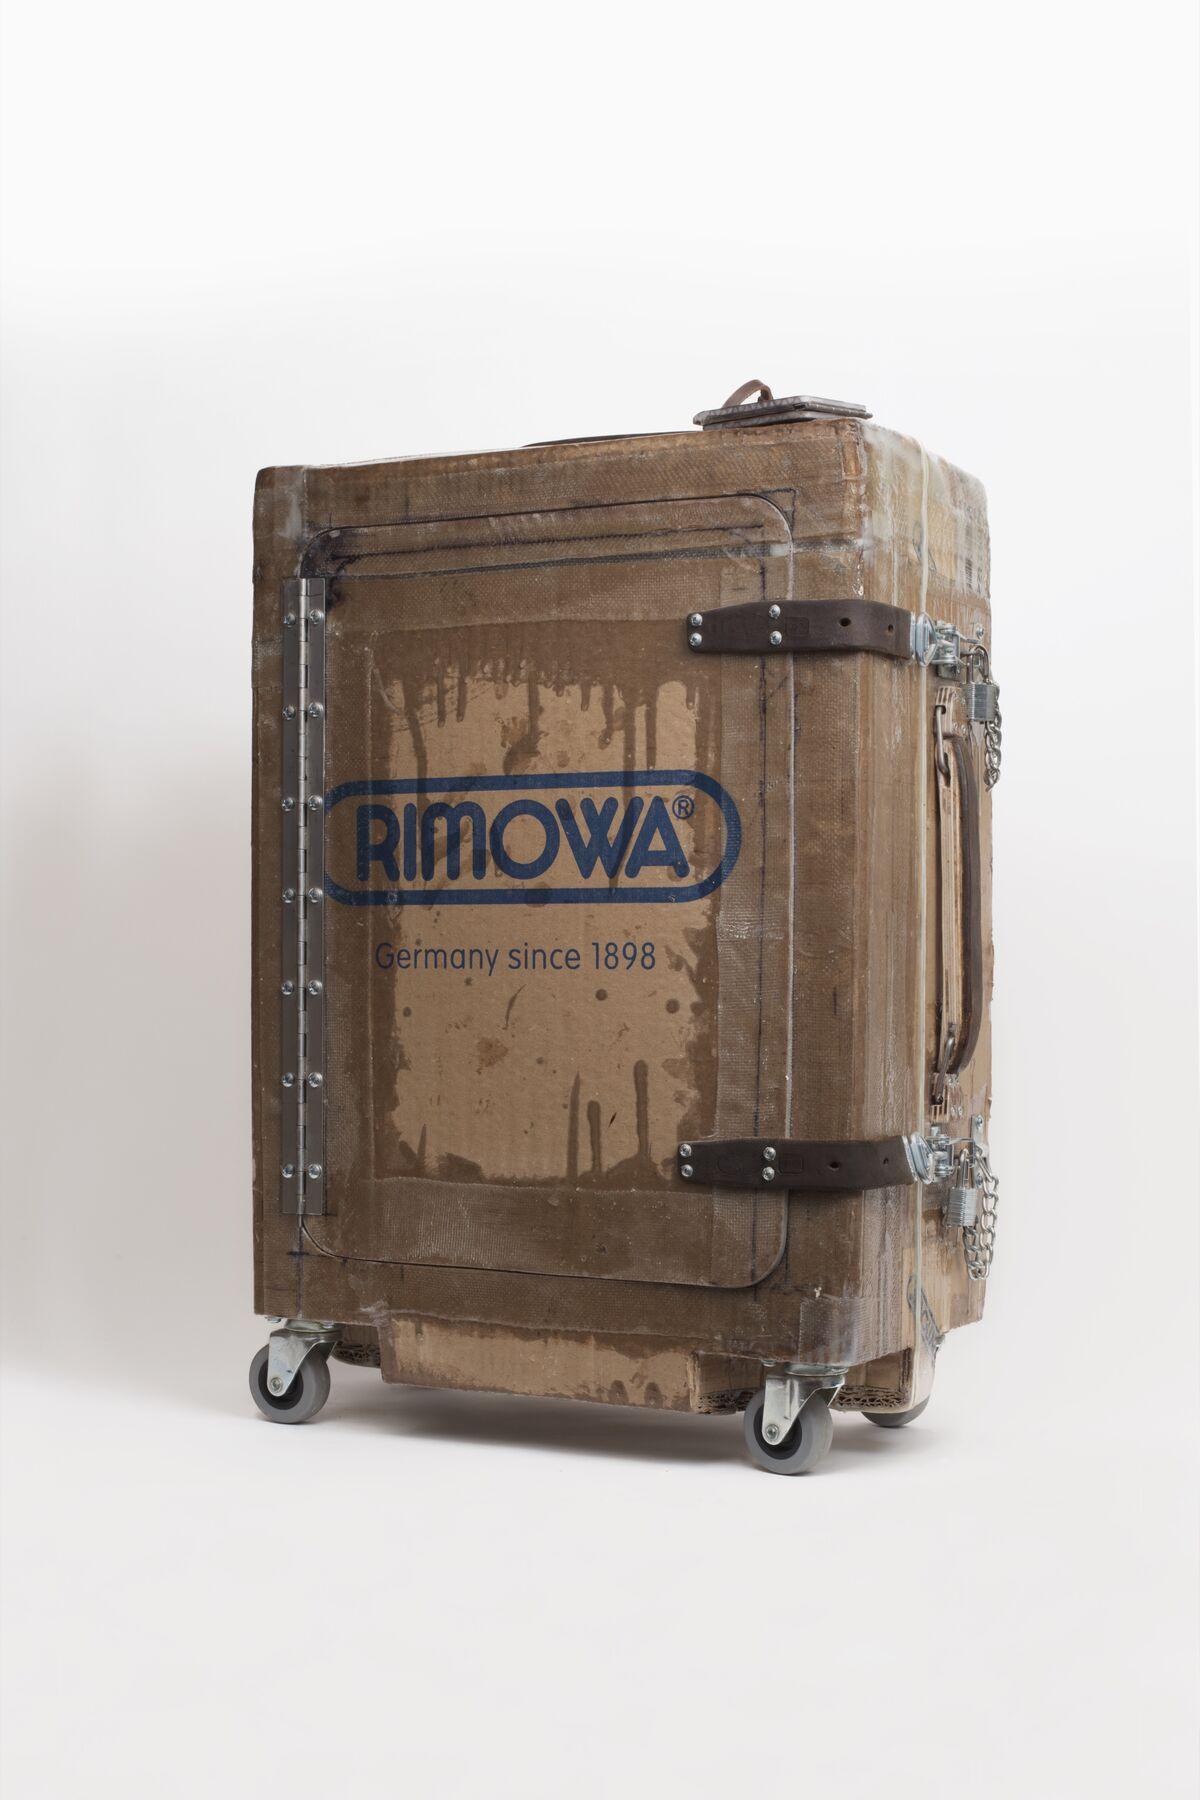 Tom Sachs, Luggage (Rimowa), 2016. © Tom Sachs. Courtesy of Galerie Thaddaeus Ropac, London, Paris, Salzburg.